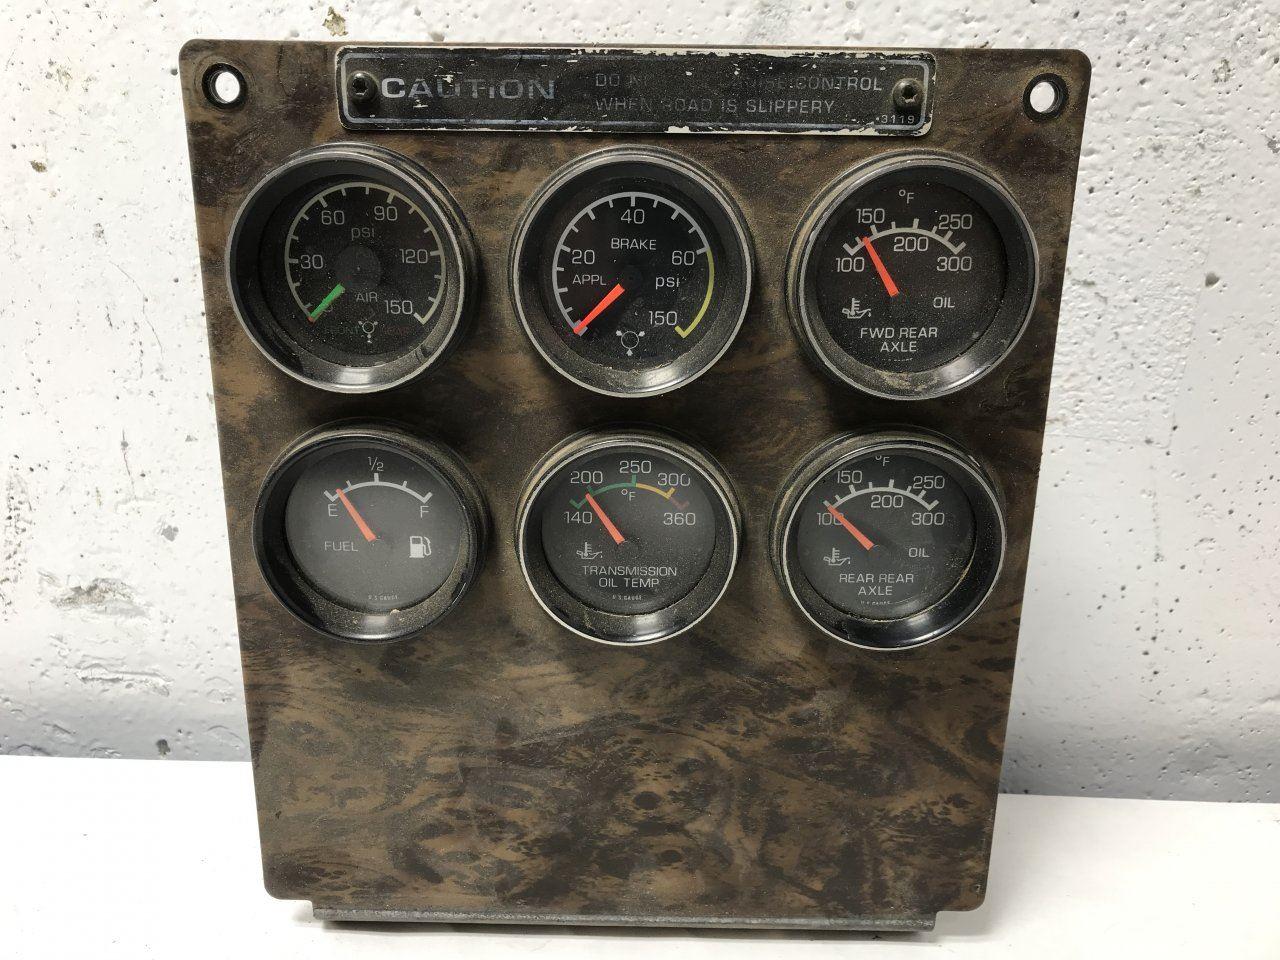 1996 Kenworth T800 (Stock #24926271)   Interior Misc Parts ...